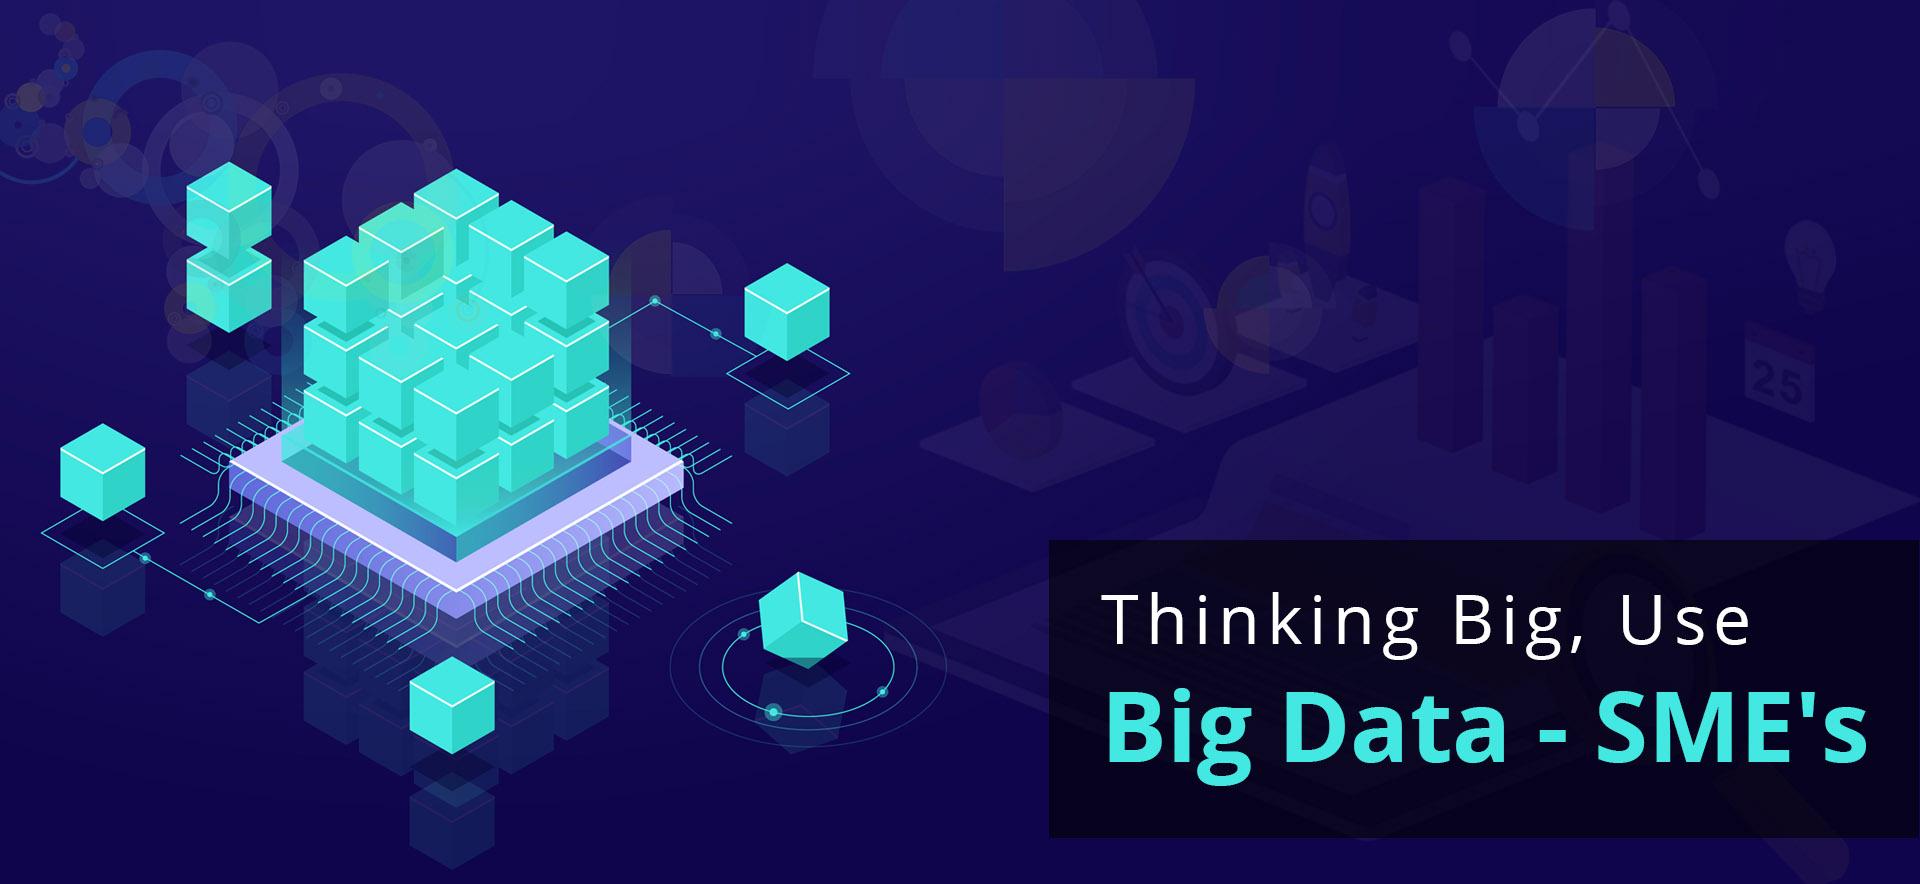 Thinking Big, Use Big Data - SME's_02